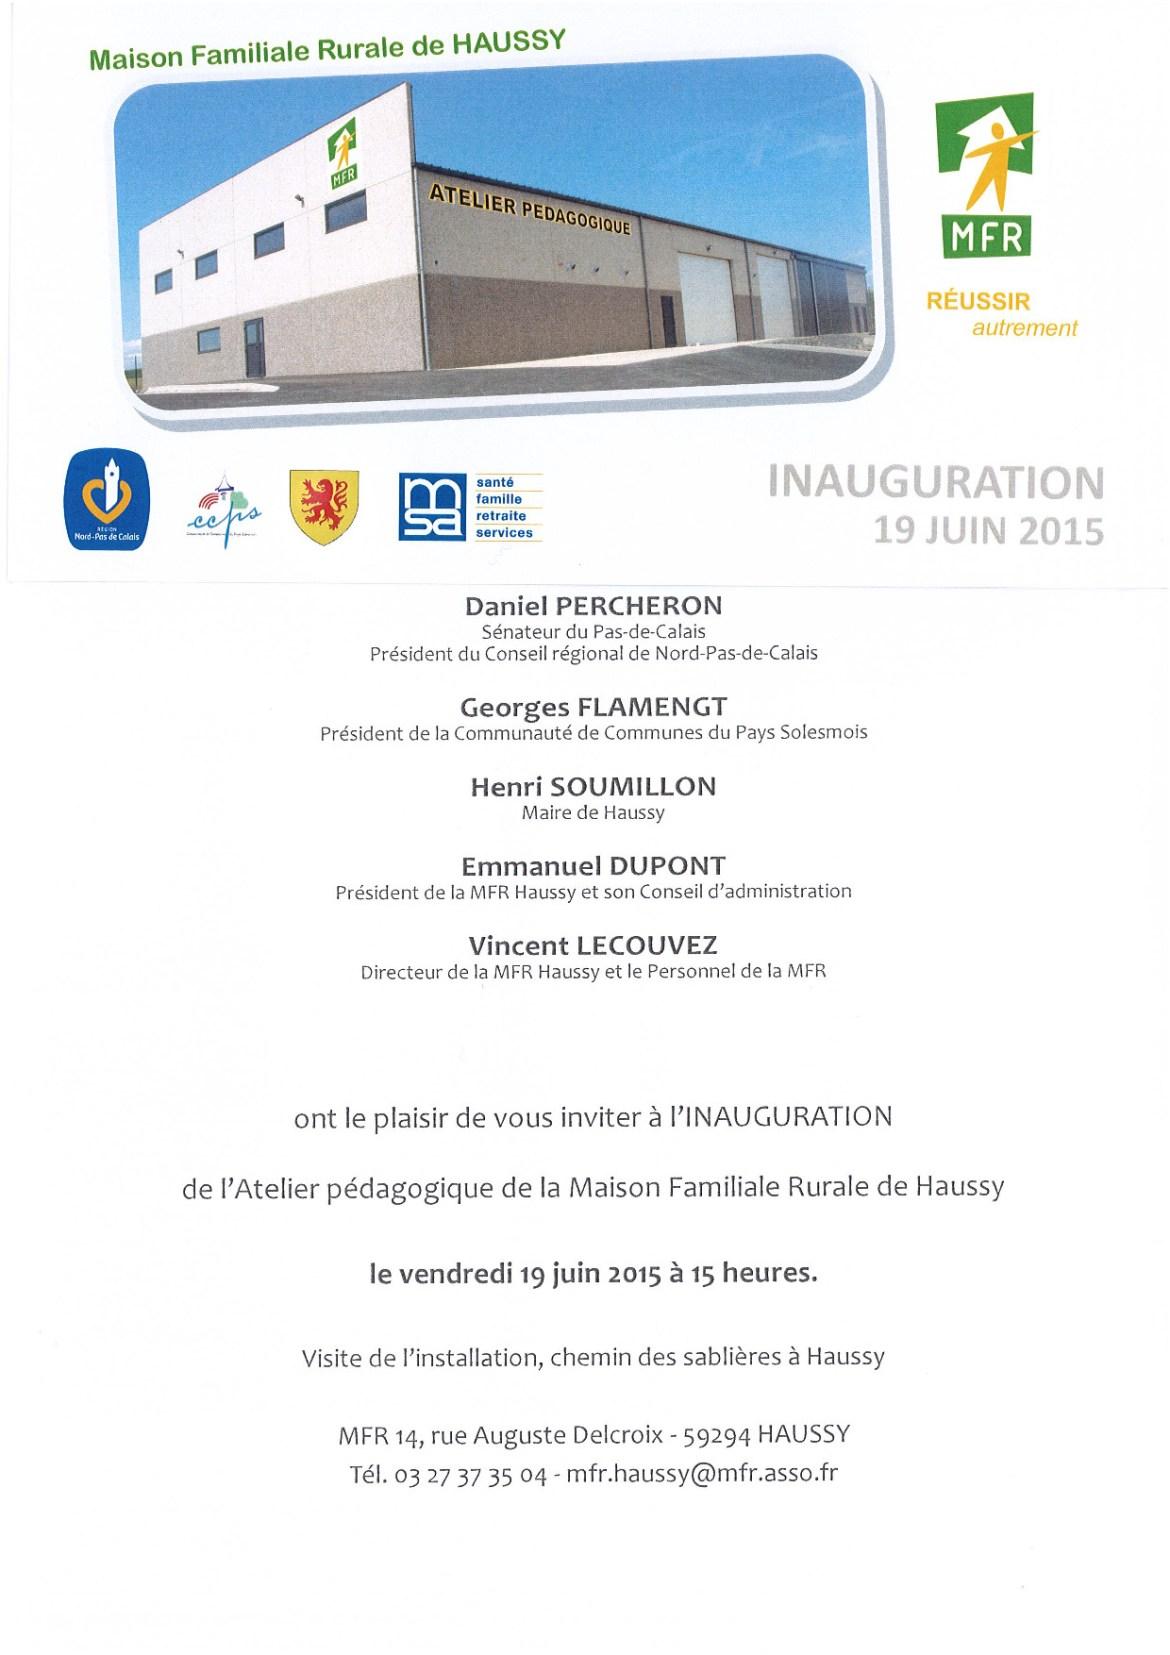 inauguration atelier 19 juin